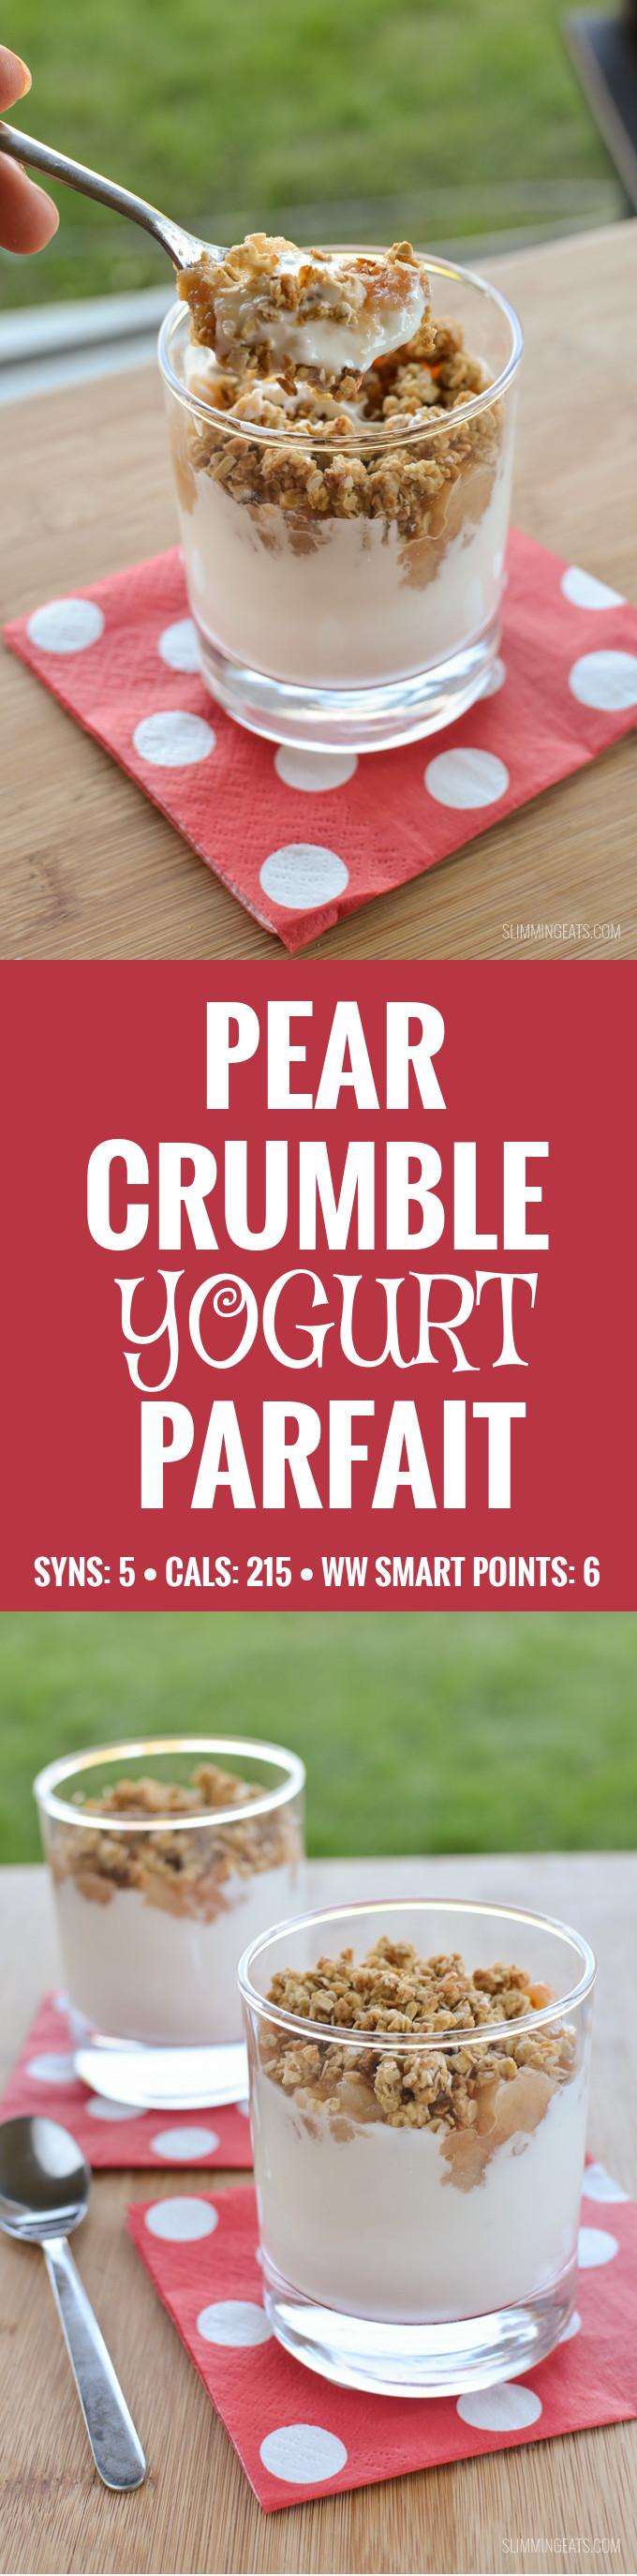 Slimming Eats Pear Crumble Yogurt Parfait - gluten free, vegetarian, Slimming World and Weight Watcher friendly